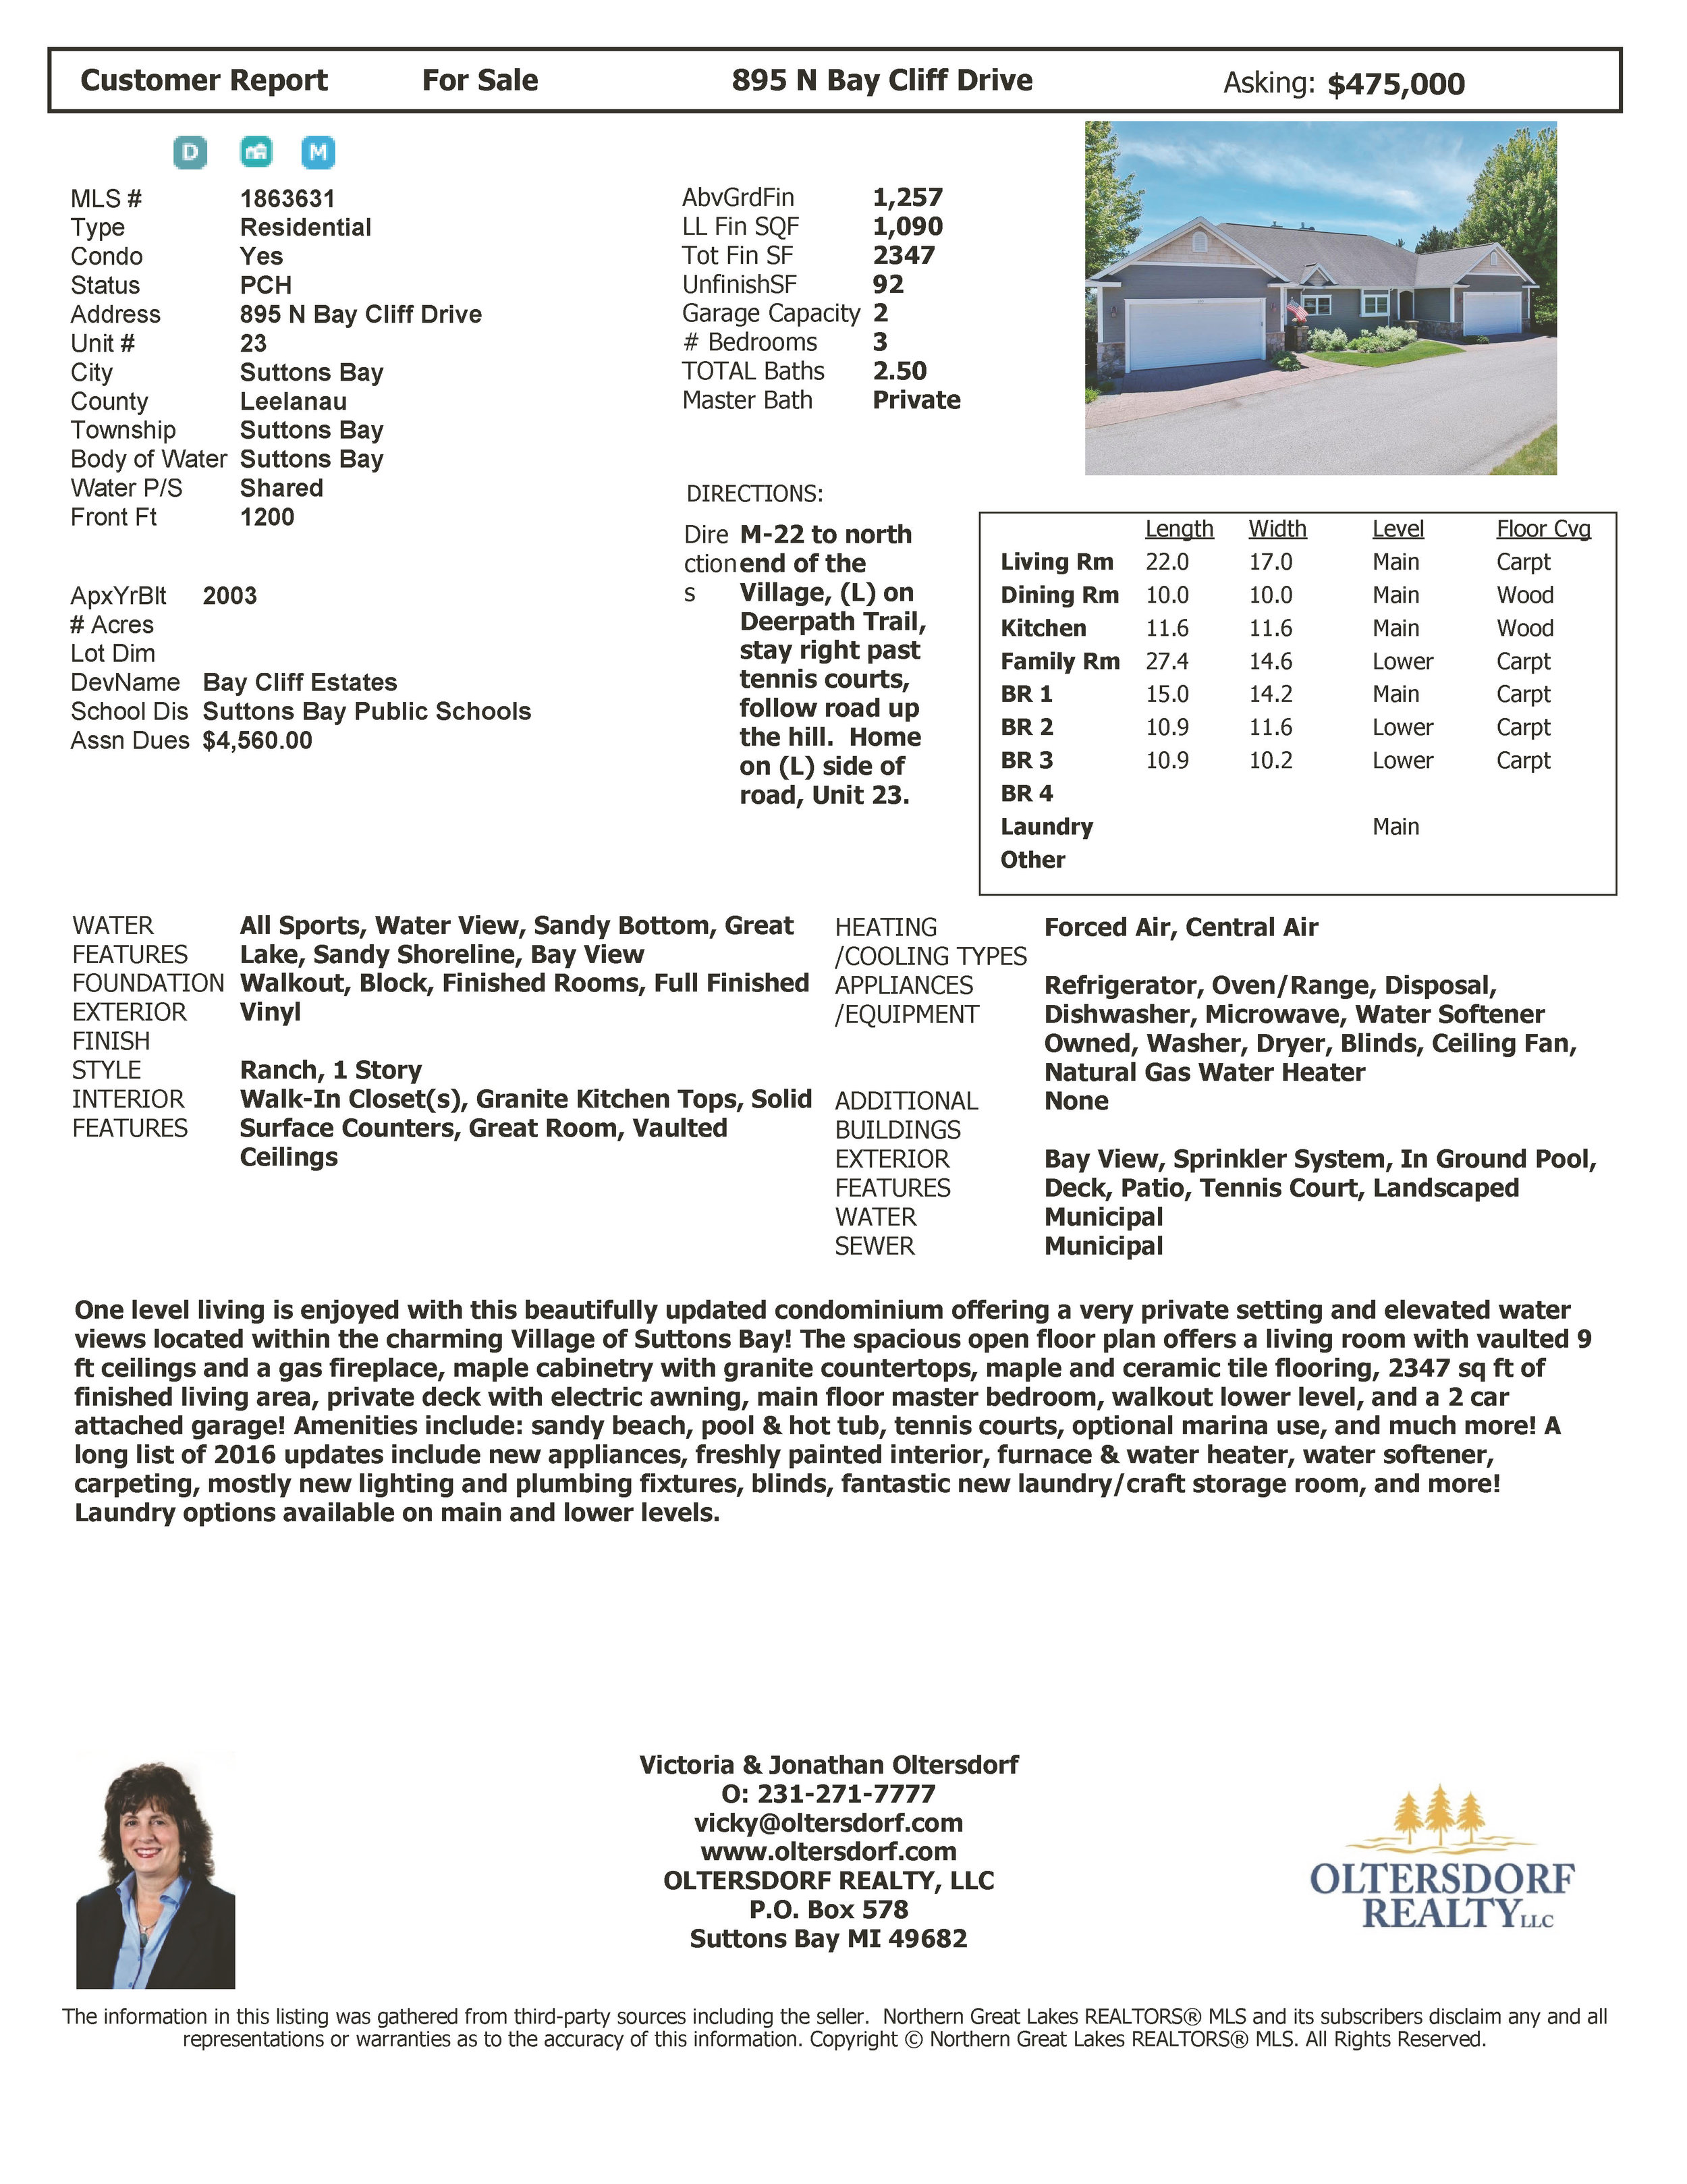 895 N Bay Cliff Drive #23, Suttons Bay - MLS Price Change.jpg